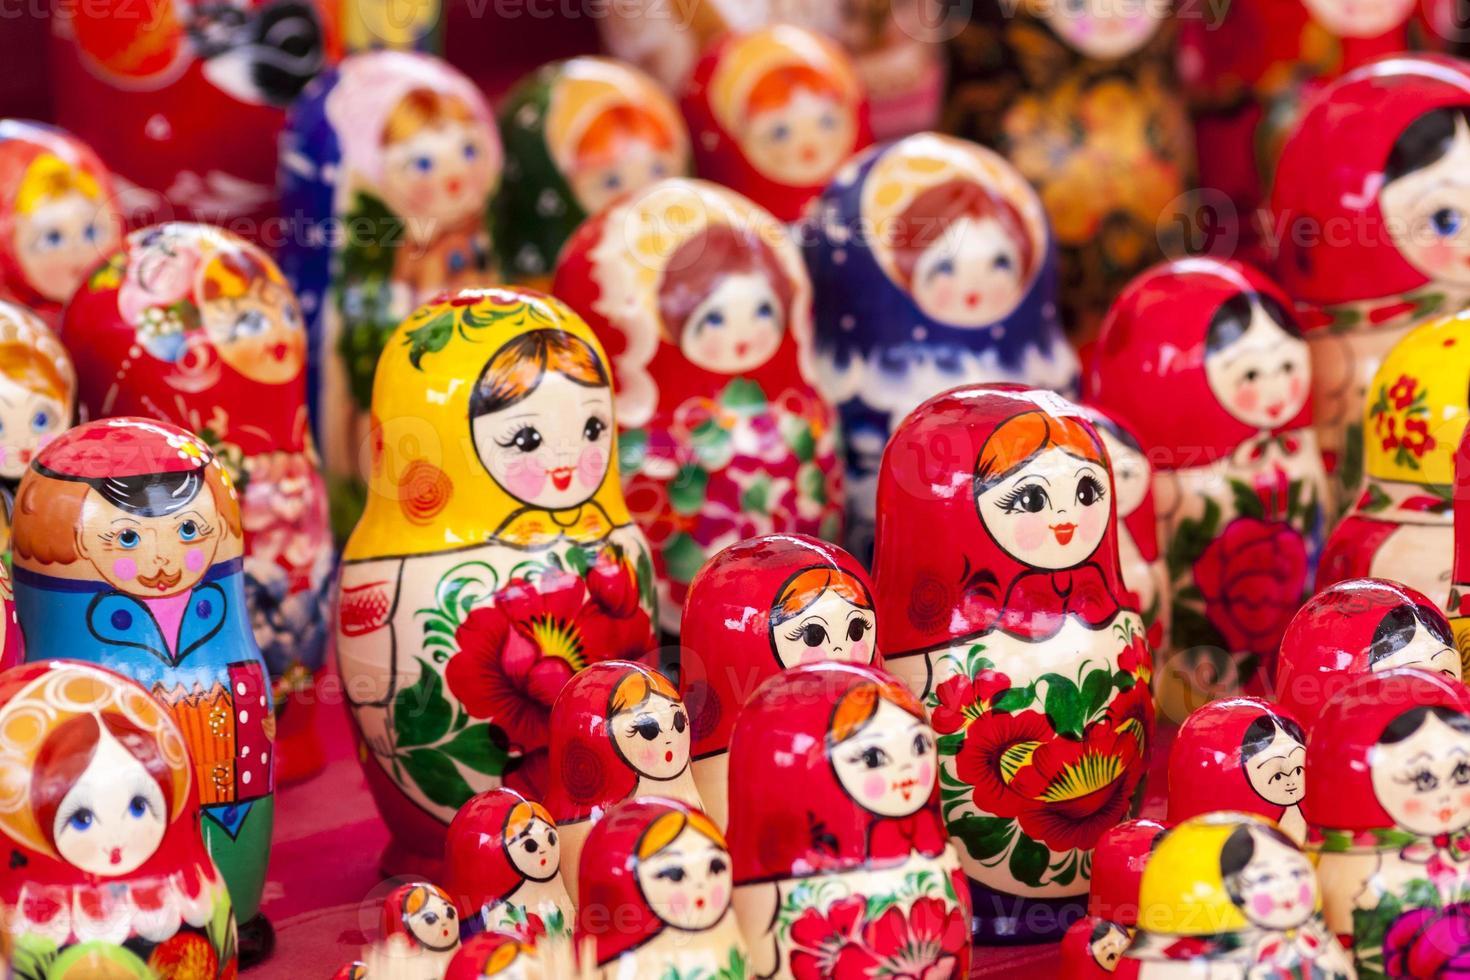 bambole ucraine russe foto